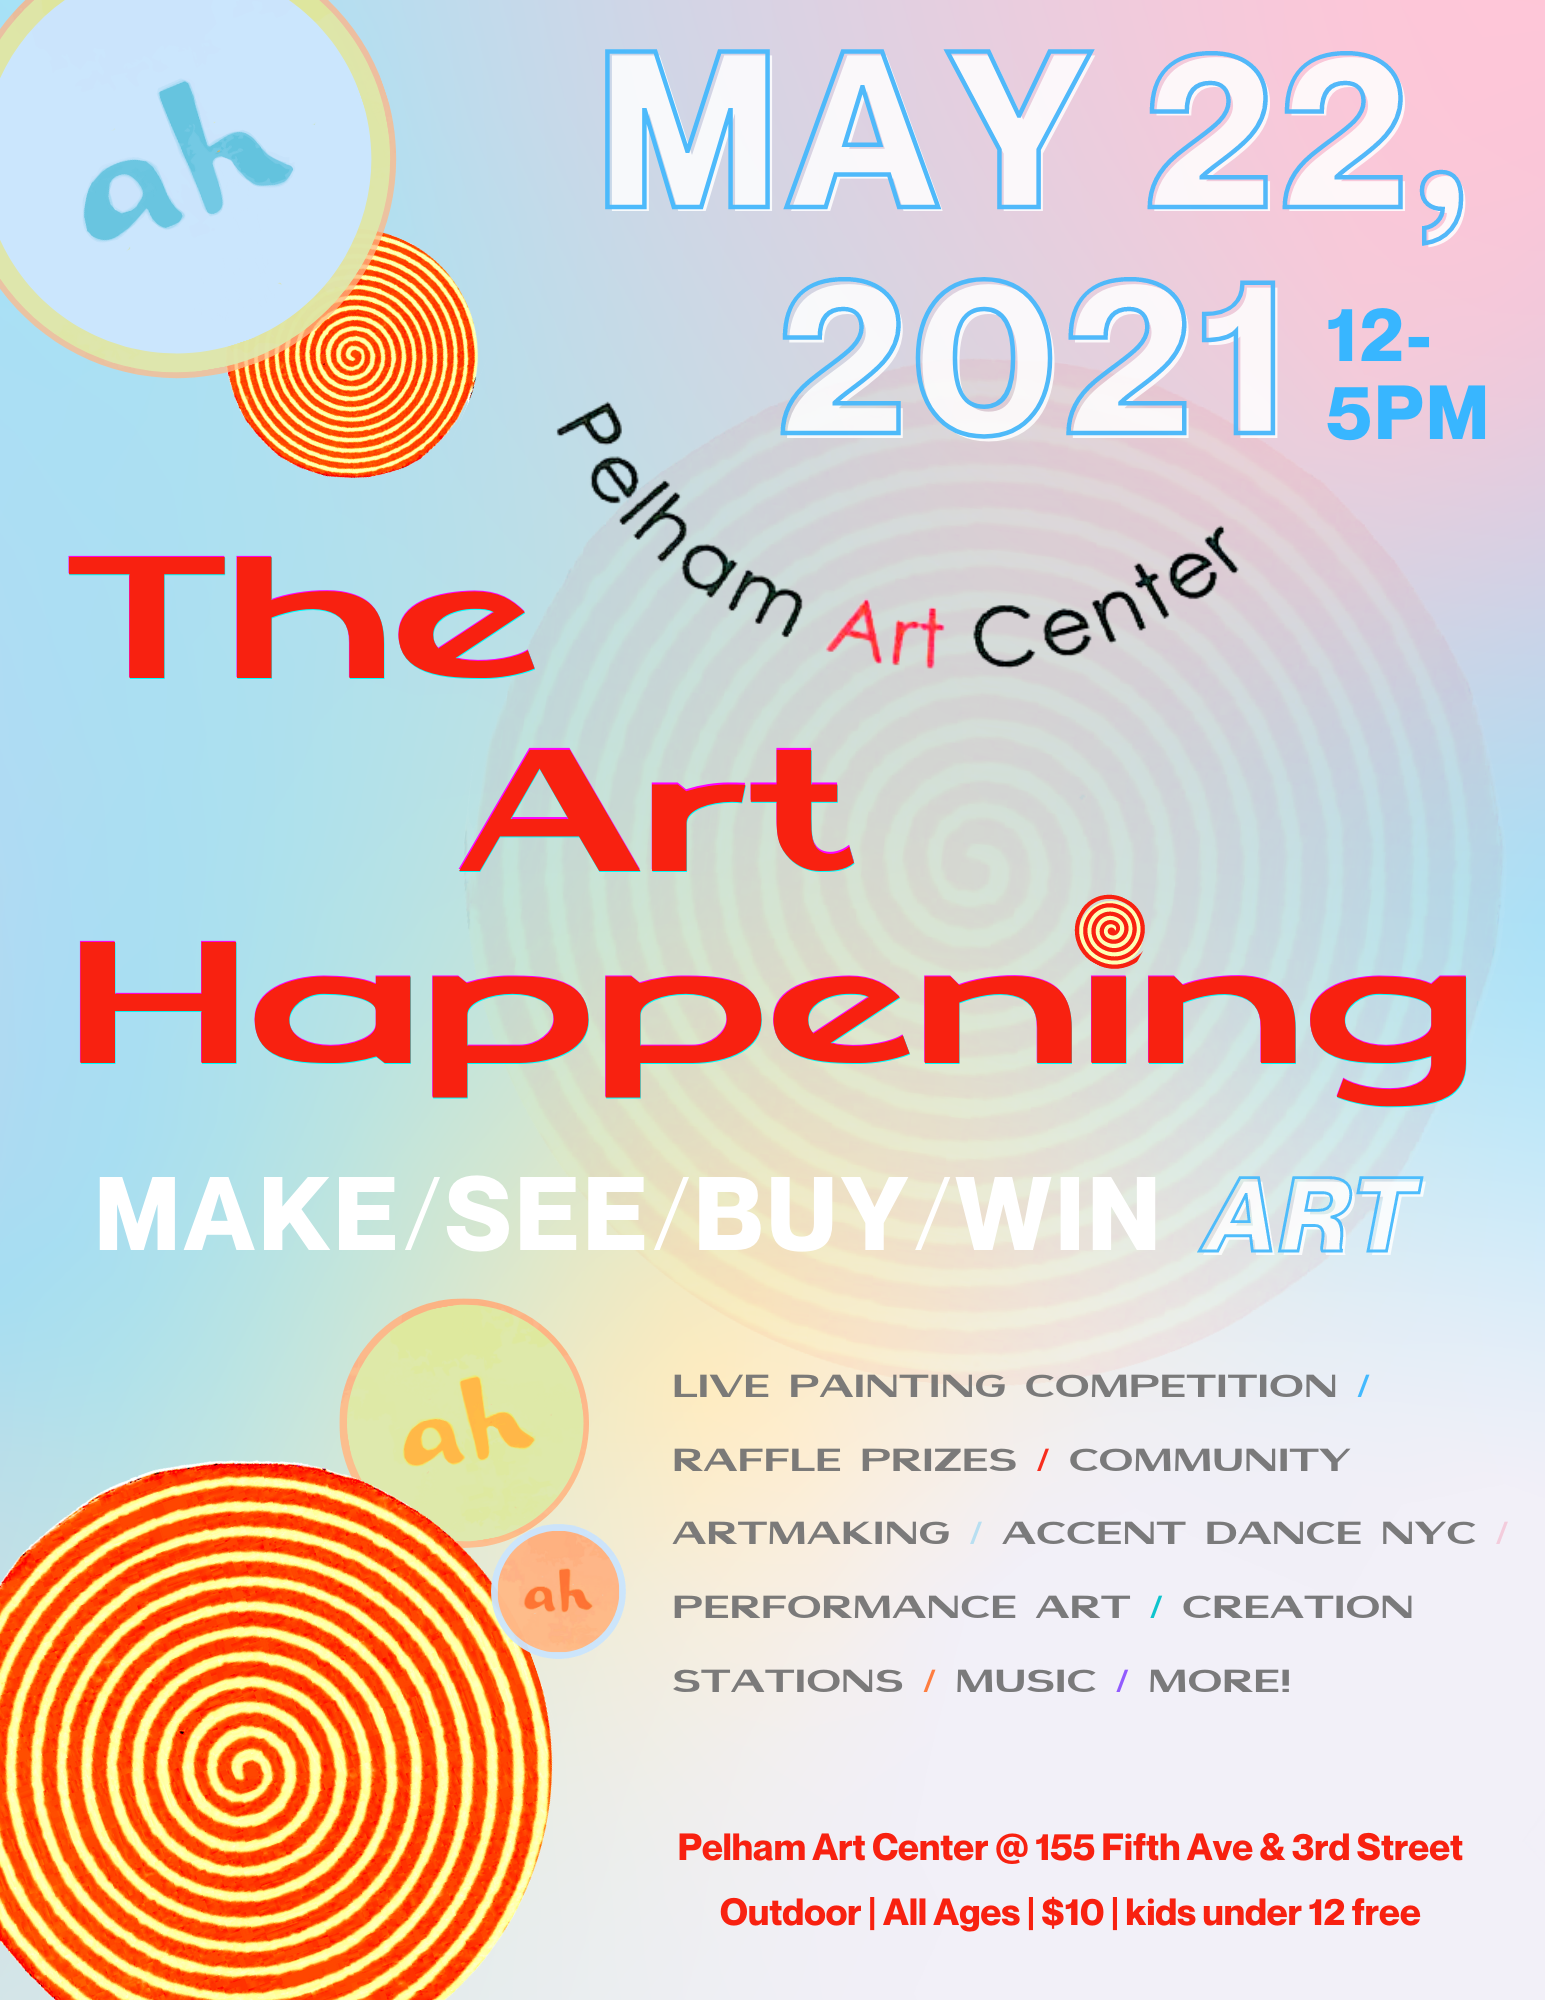 The Art Happening! at Pelham Art Center